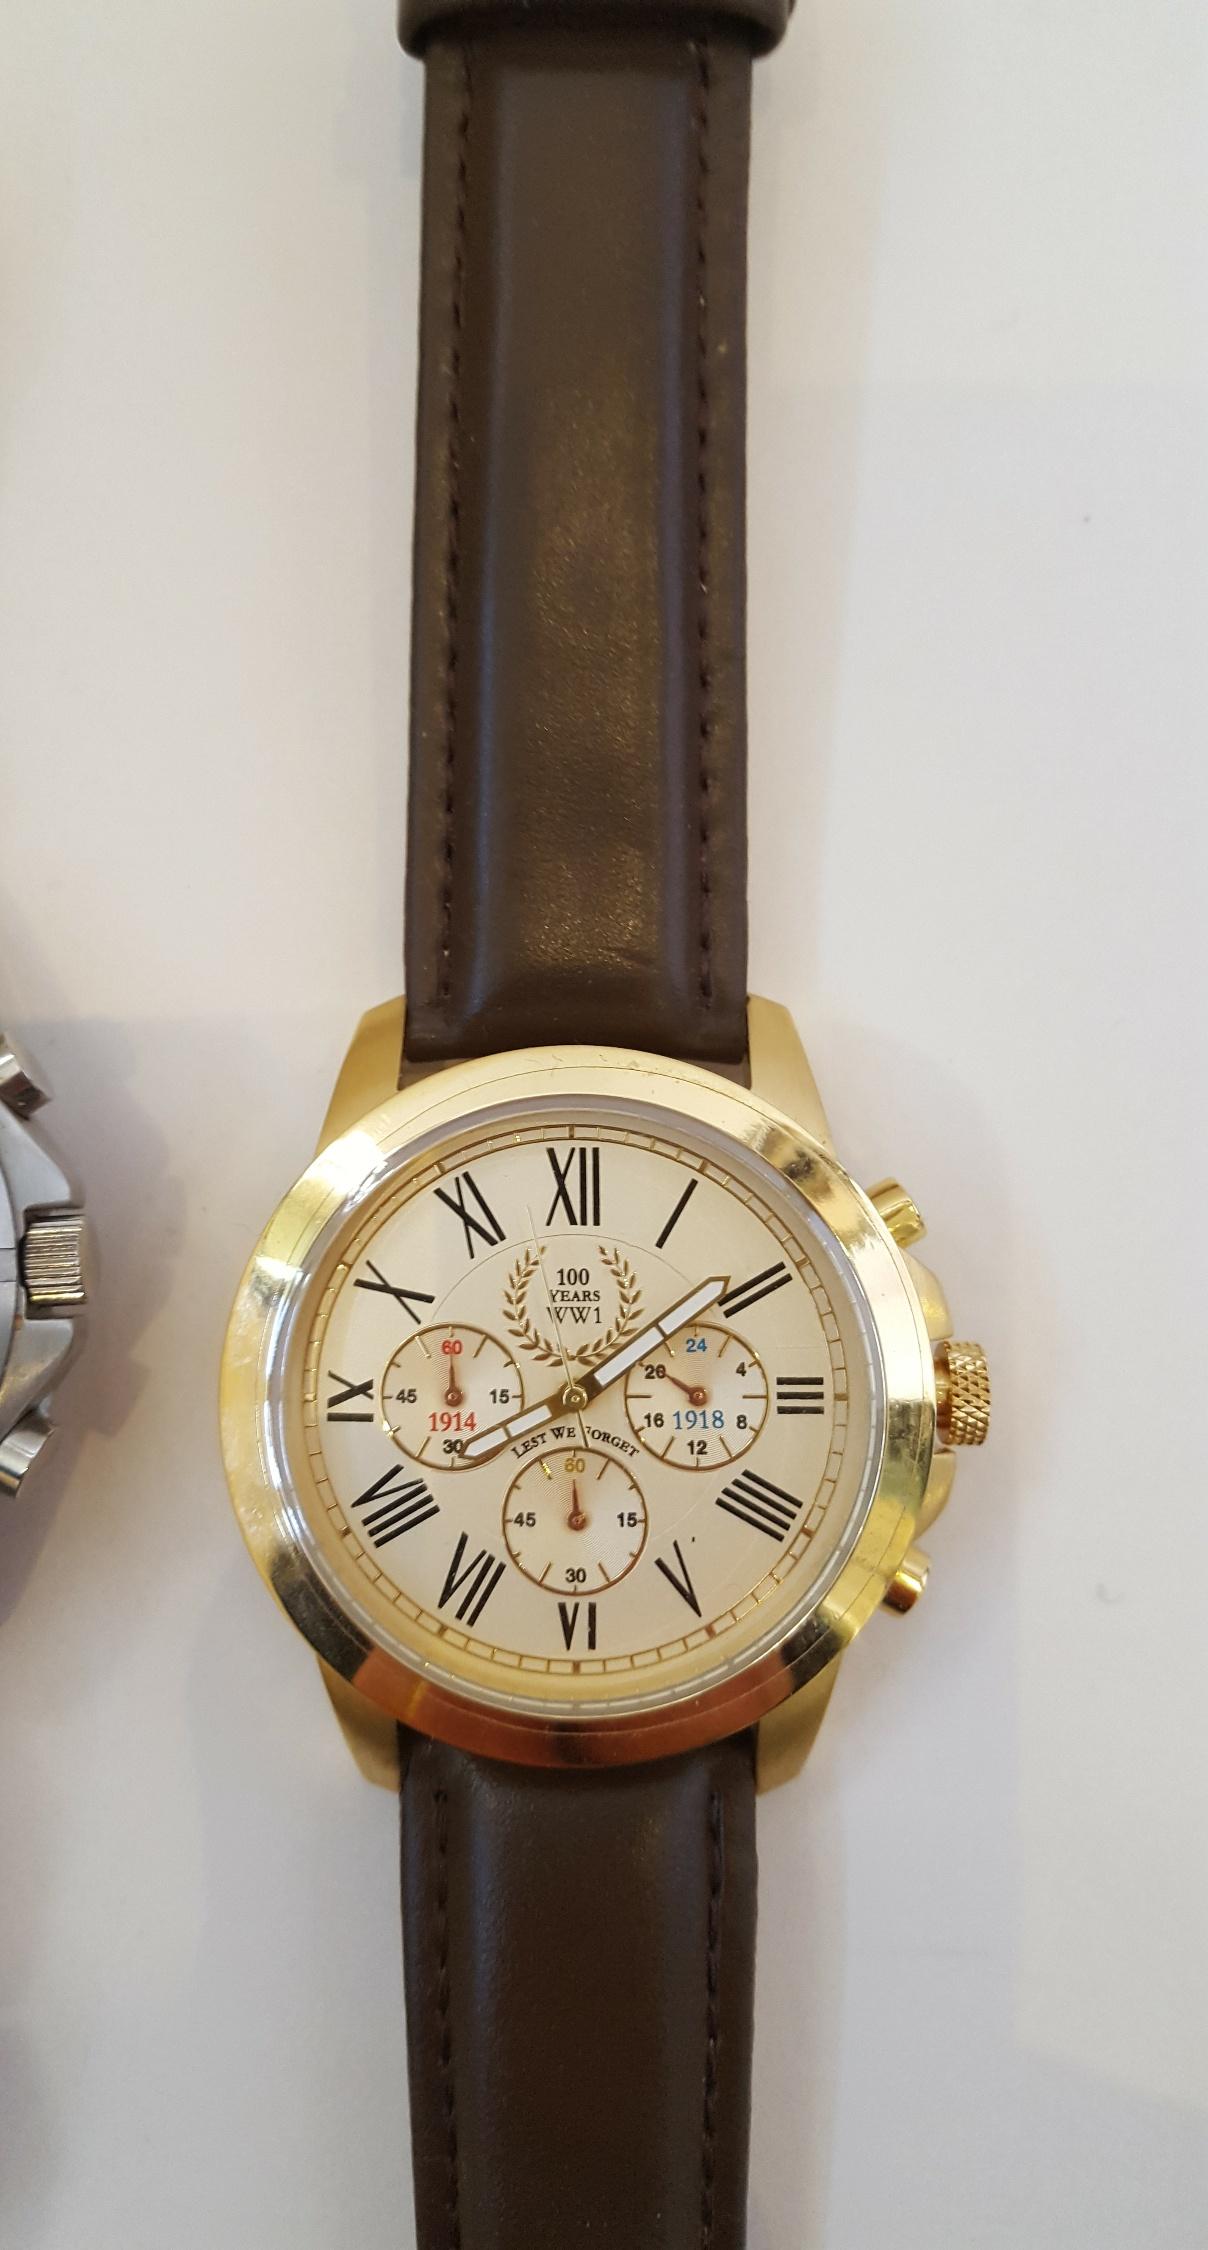 Lot 20 - Vintage Wrist Watches 1 x Royal Marine Commando & 1 x Lest We Forget WWI Rememberance Watch